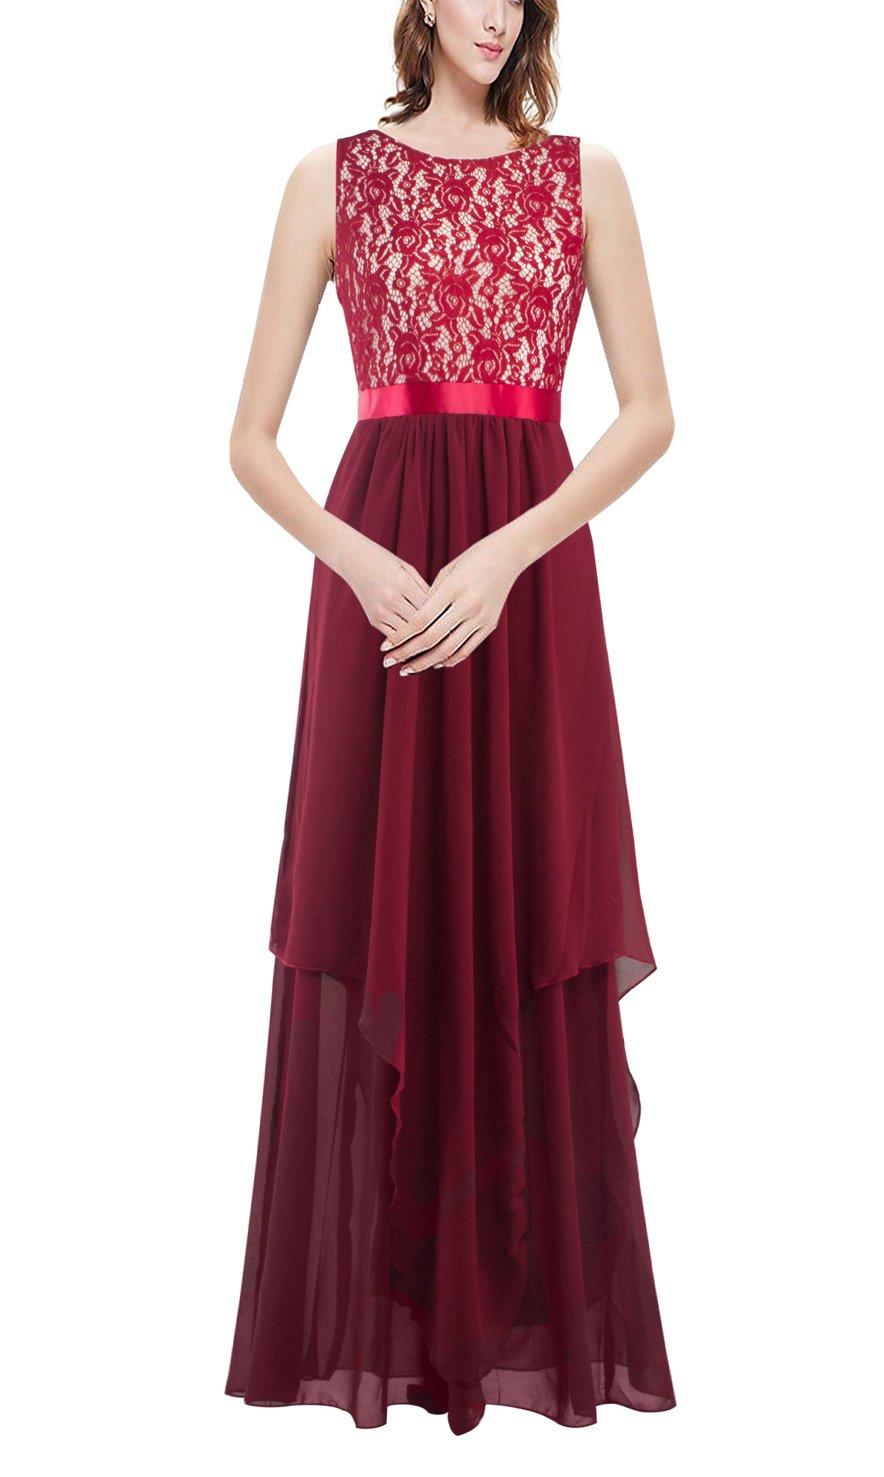 DoubleYI Damen Elegant Kleider Lang Spitzen Chiffon Abendkleid Maxikleid  Cocktailkleid: Amazon.de: Bekleidung